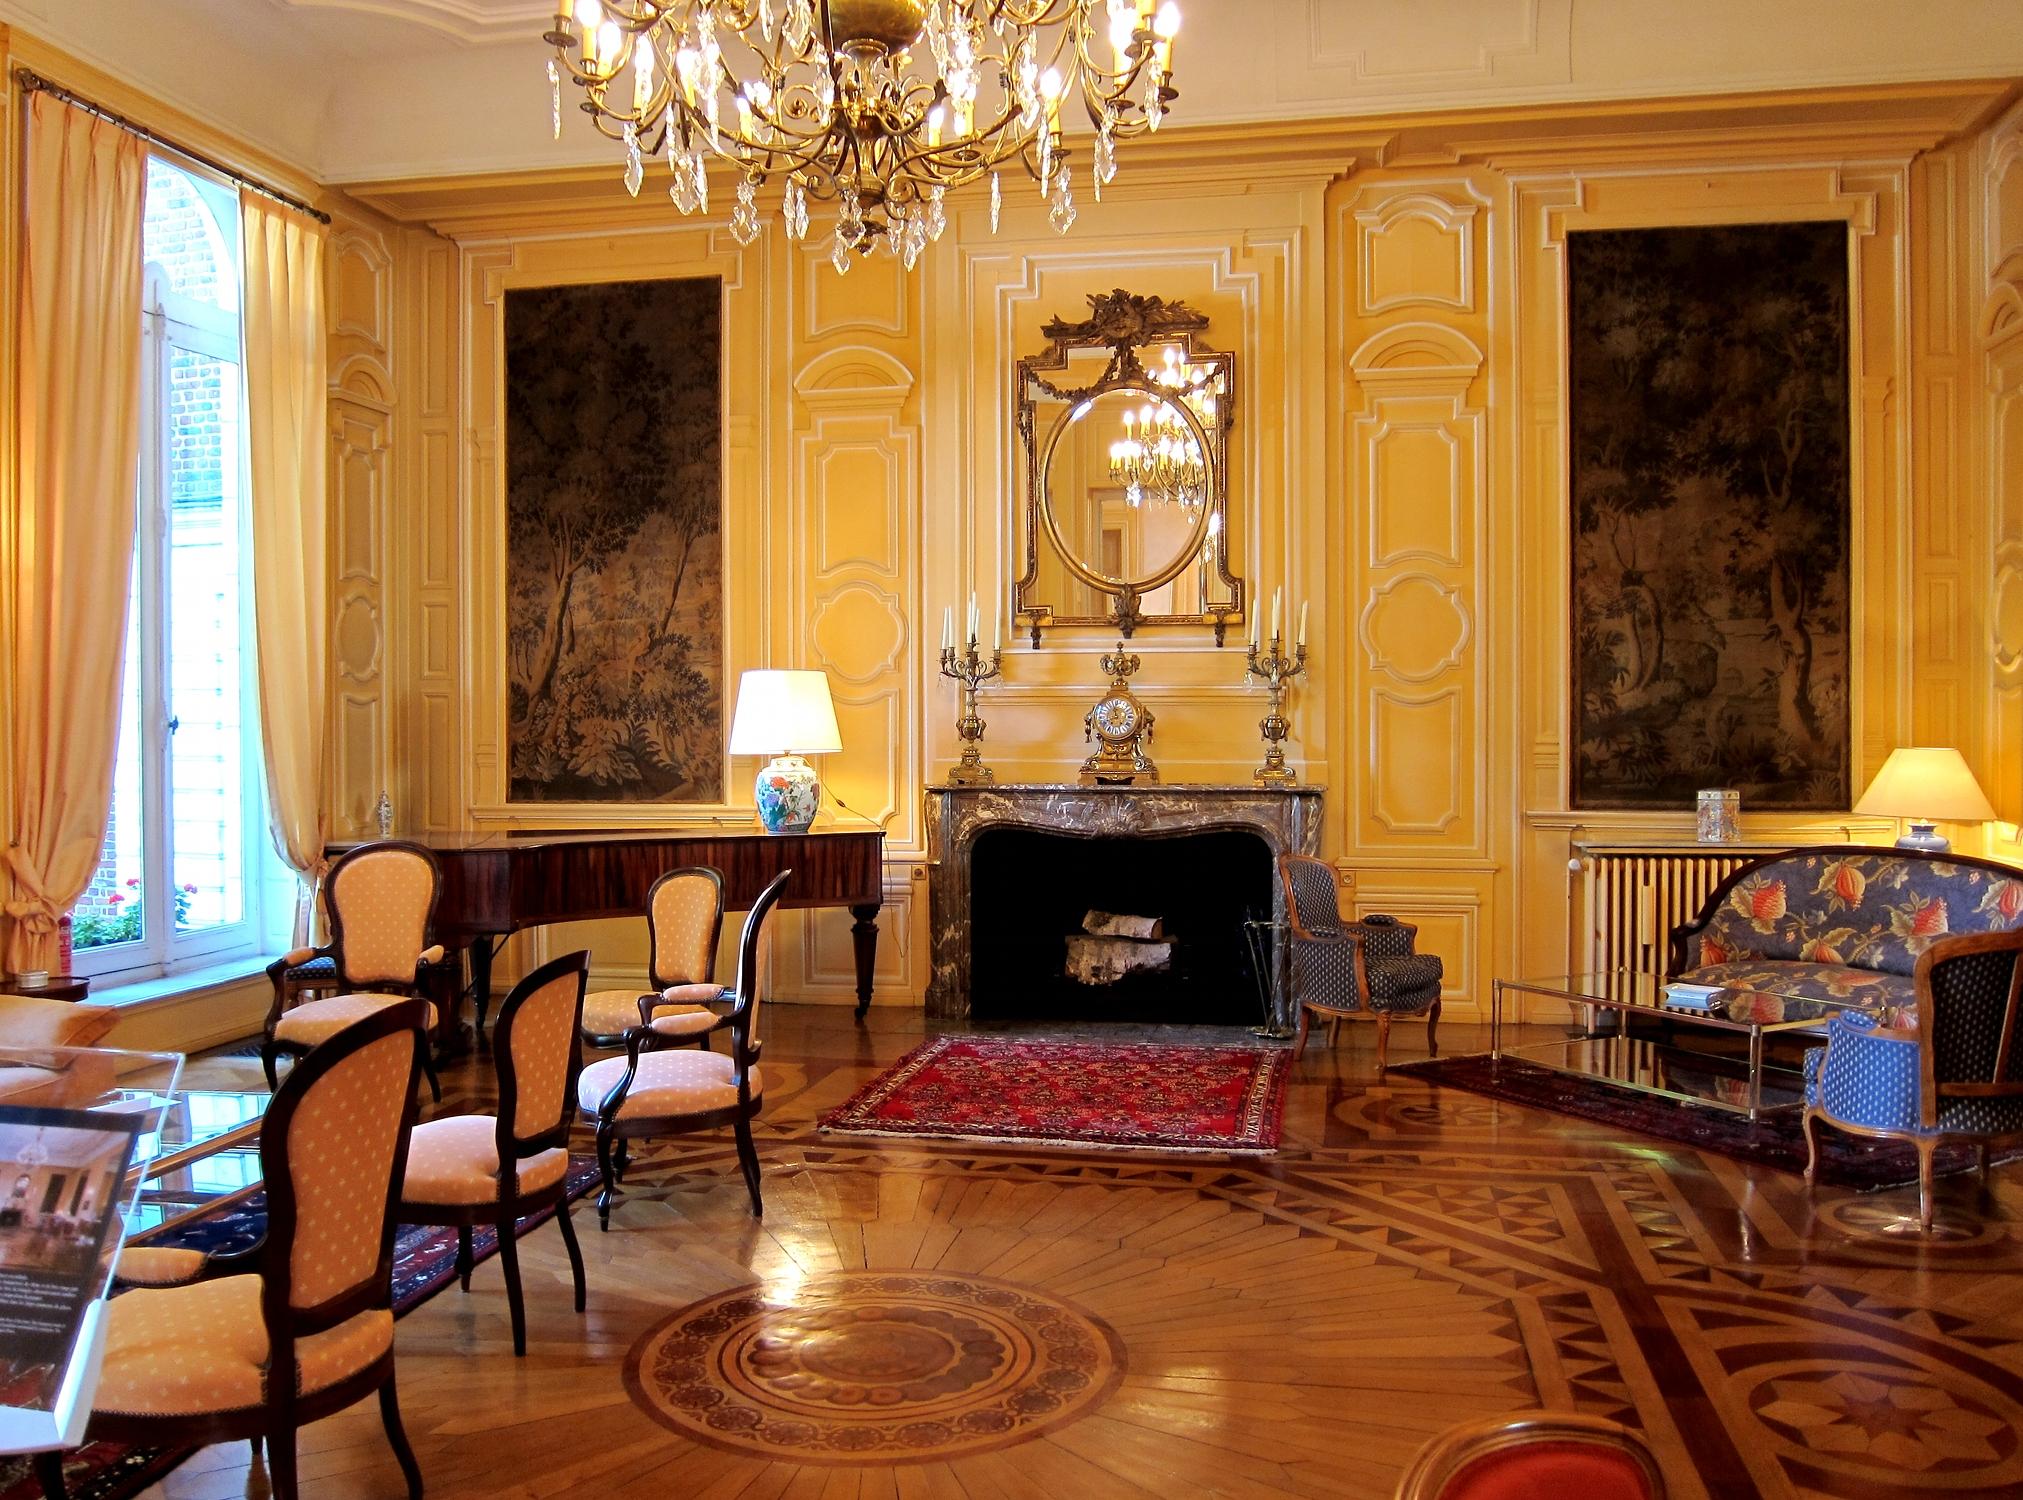 Architecte D Intérieur Lille file:lille hotel d'ailly grand salon - wikimedia commons